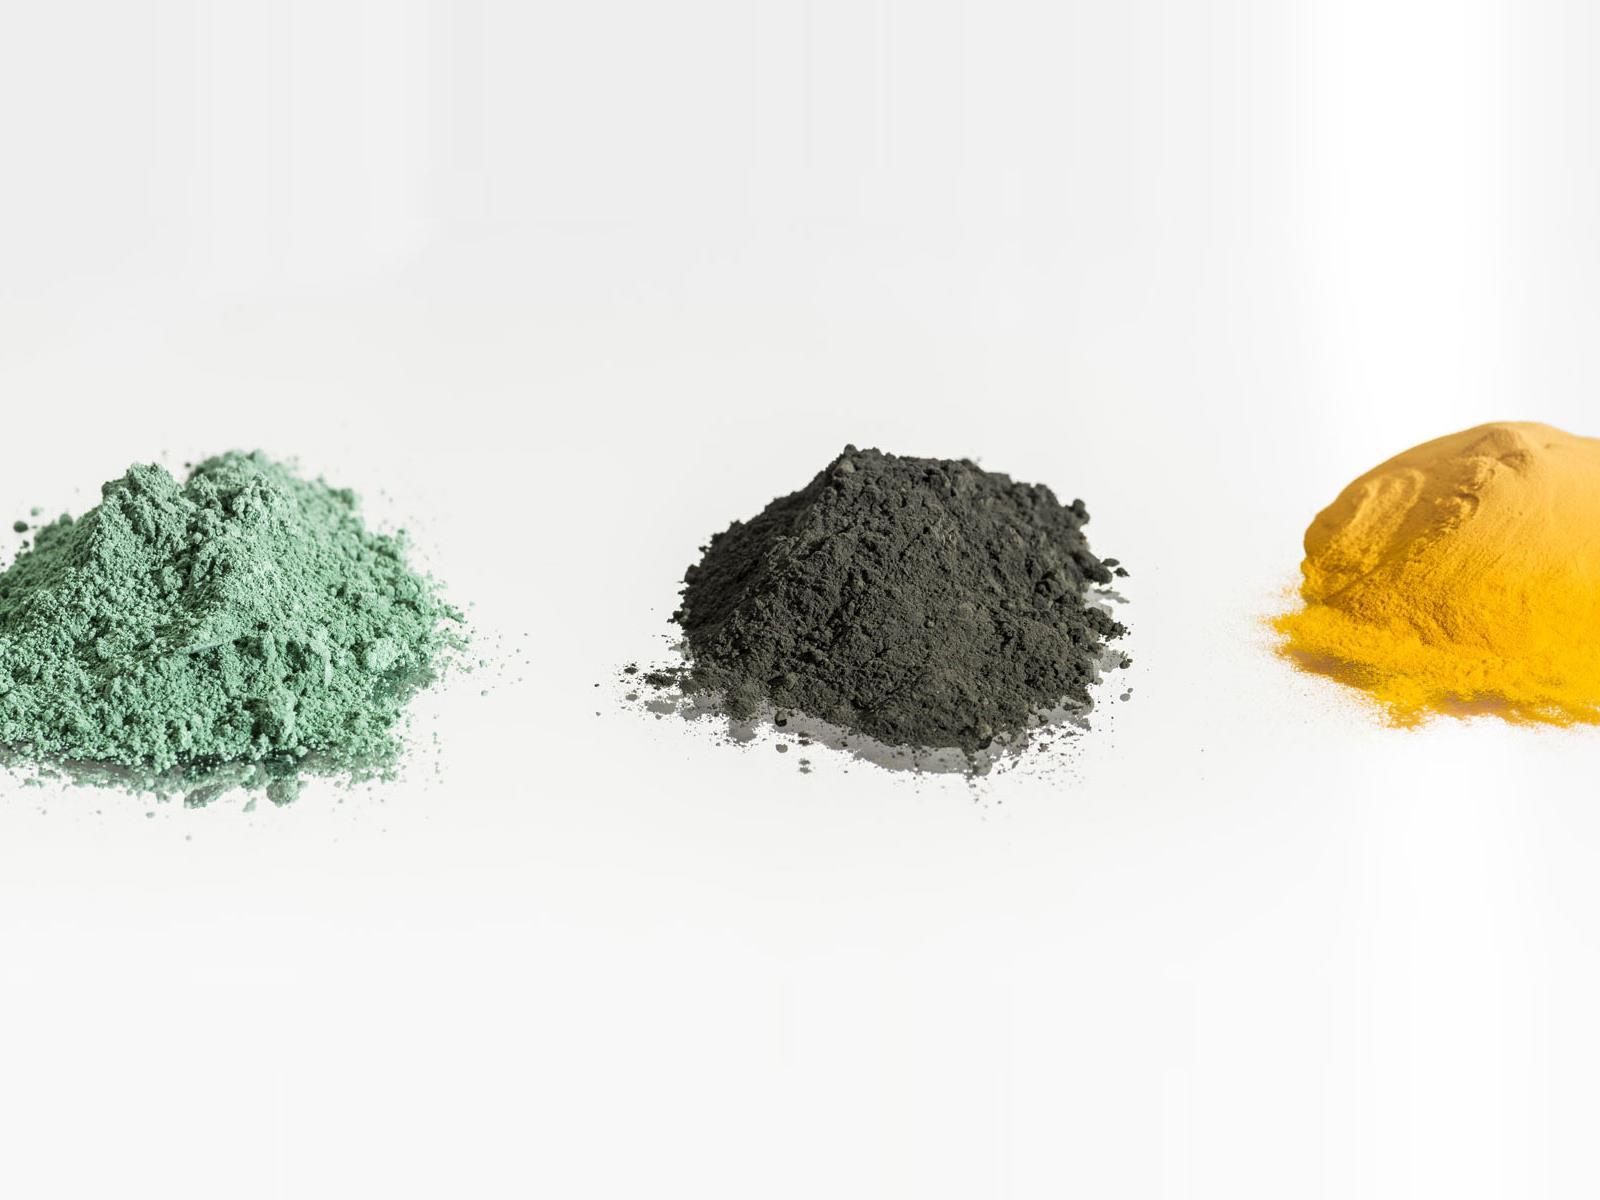 Echantillons de minerai : Tetrafluorure d'Uranium (UF4), Yellow cake (calciné et naturel)